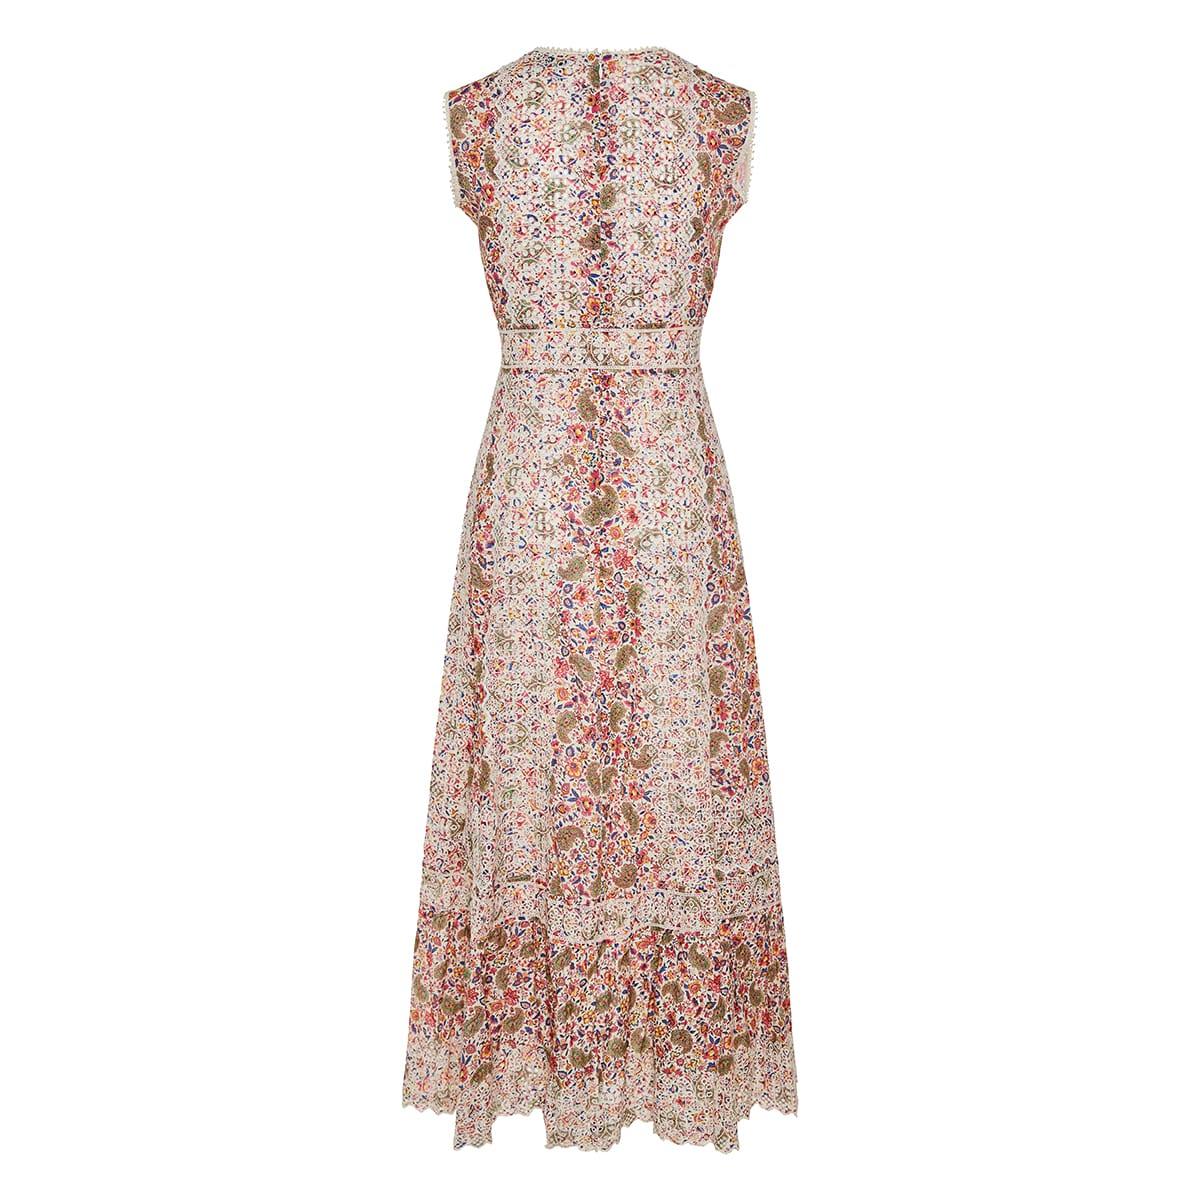 Lace-paneled long printed dress